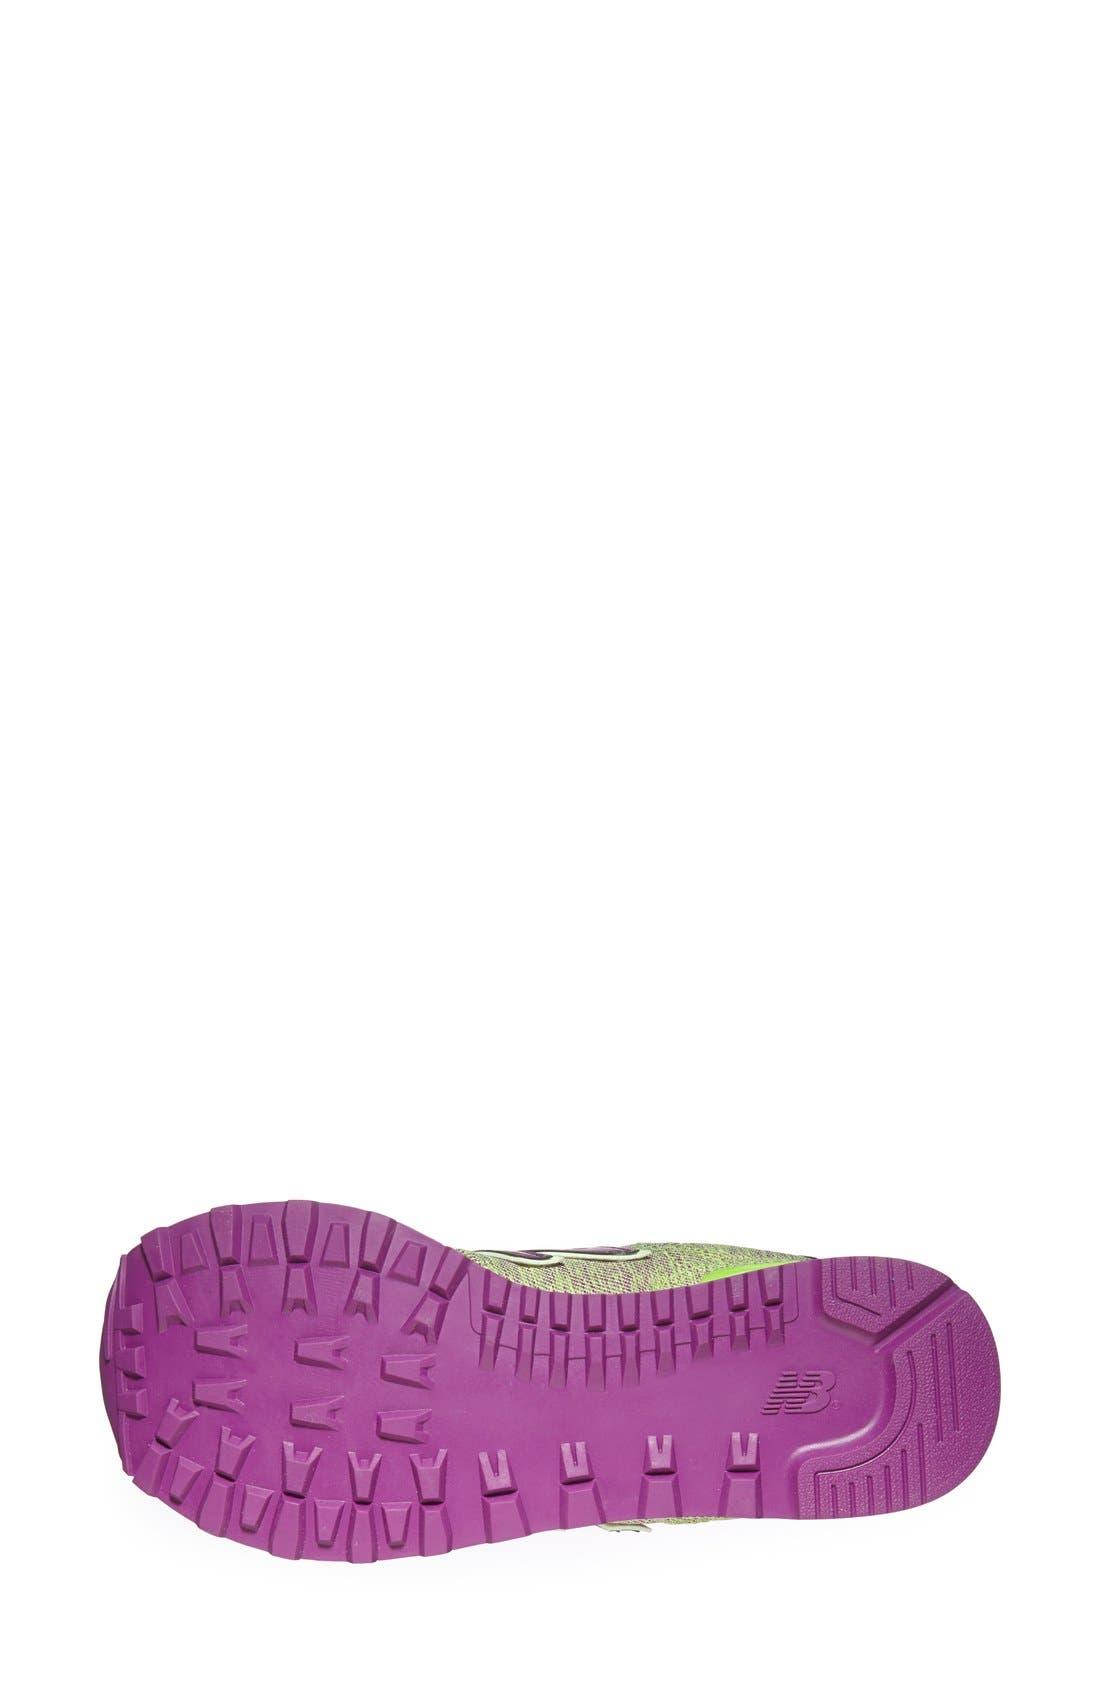 Alternate Image 3  - New Balance '574 - Static' Sneaker (Women)